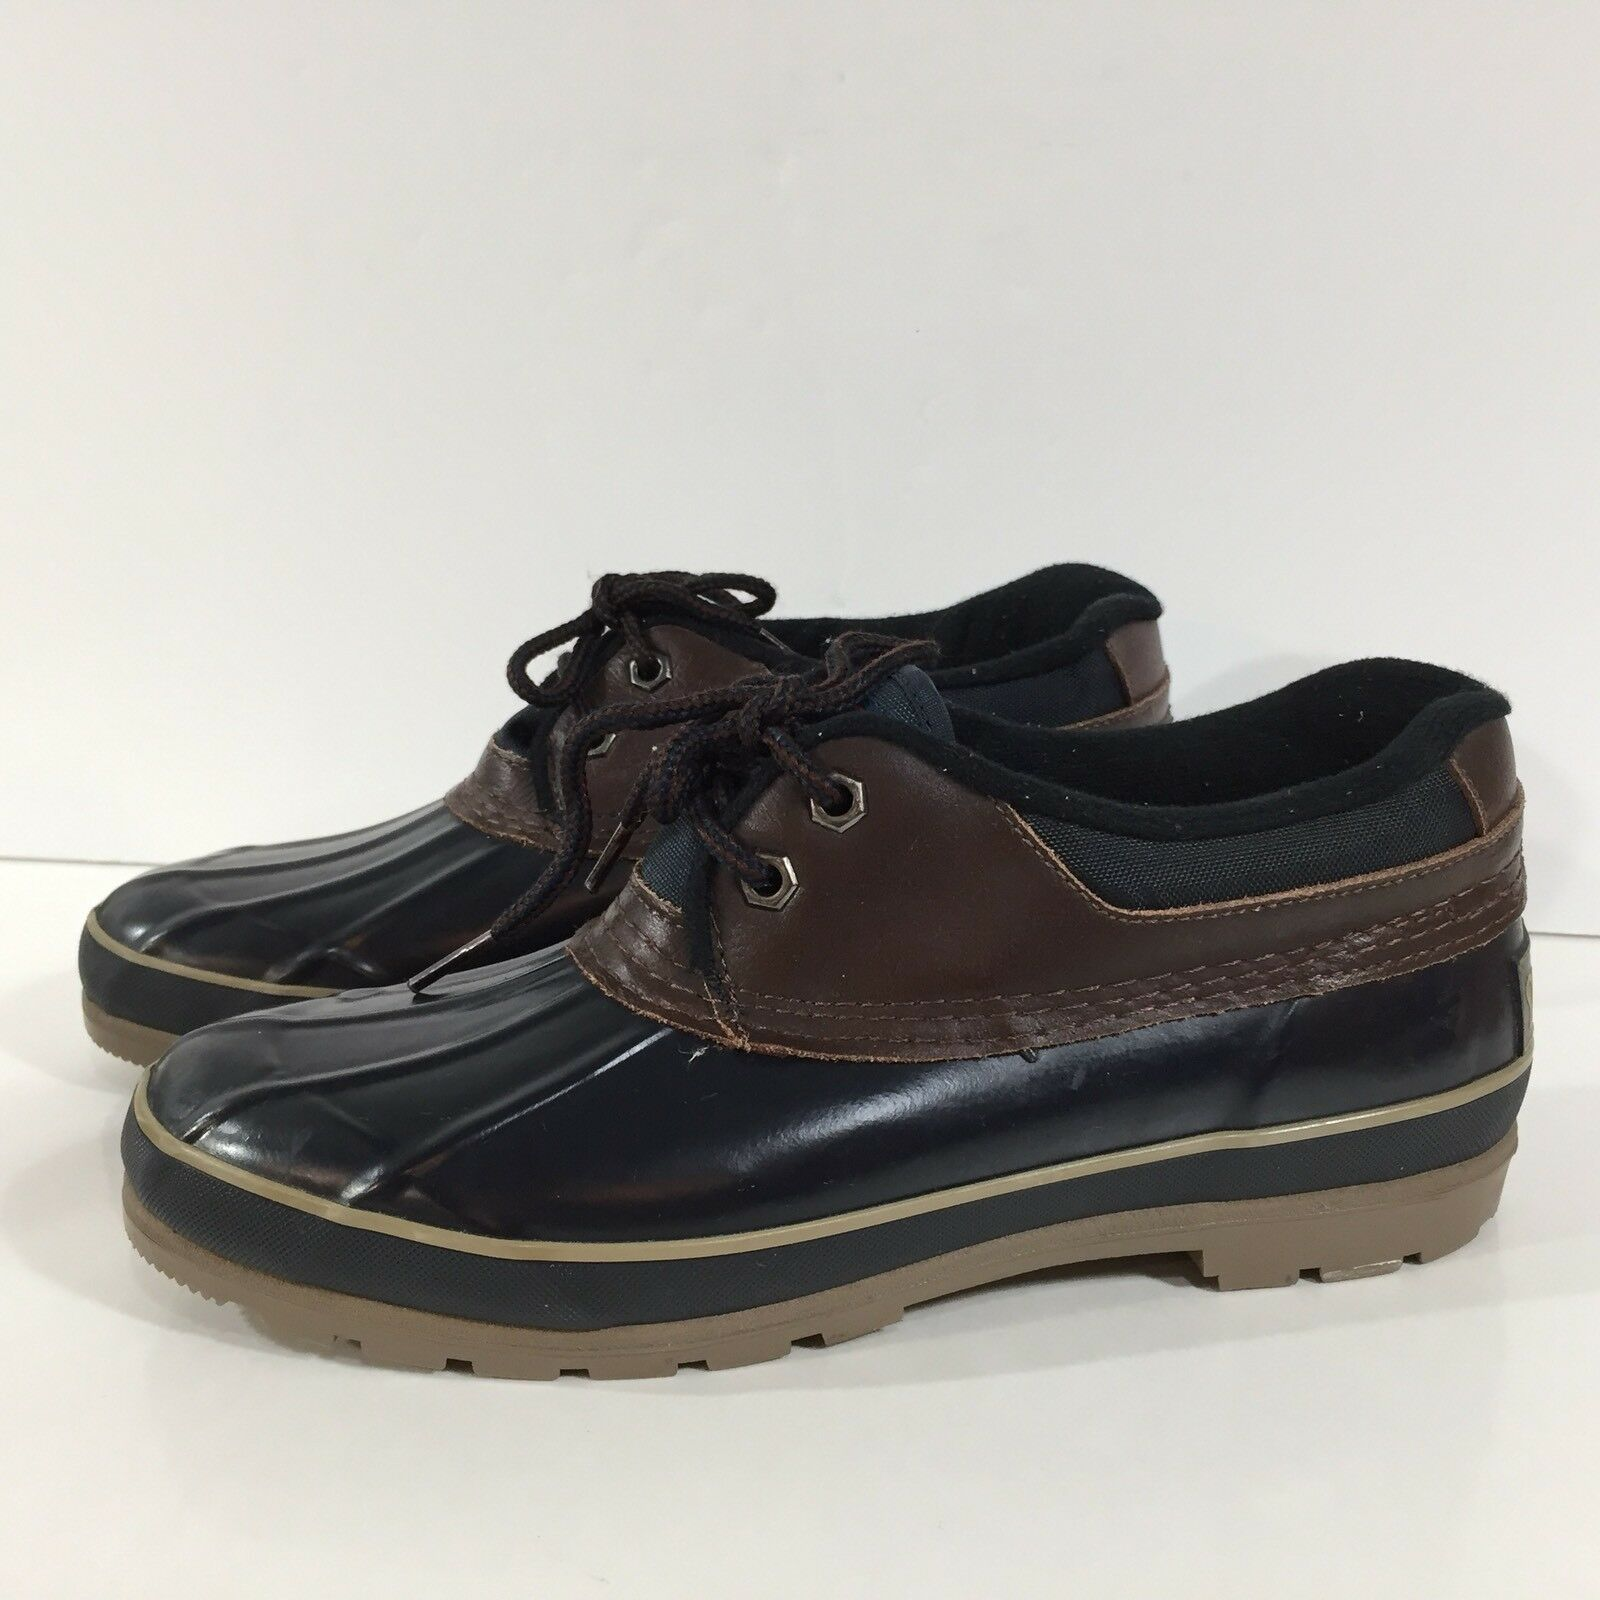 Womens Vintage SPORTO Size 8 Navy Rubber Leather Waterproof Duck shoes Rain Boot